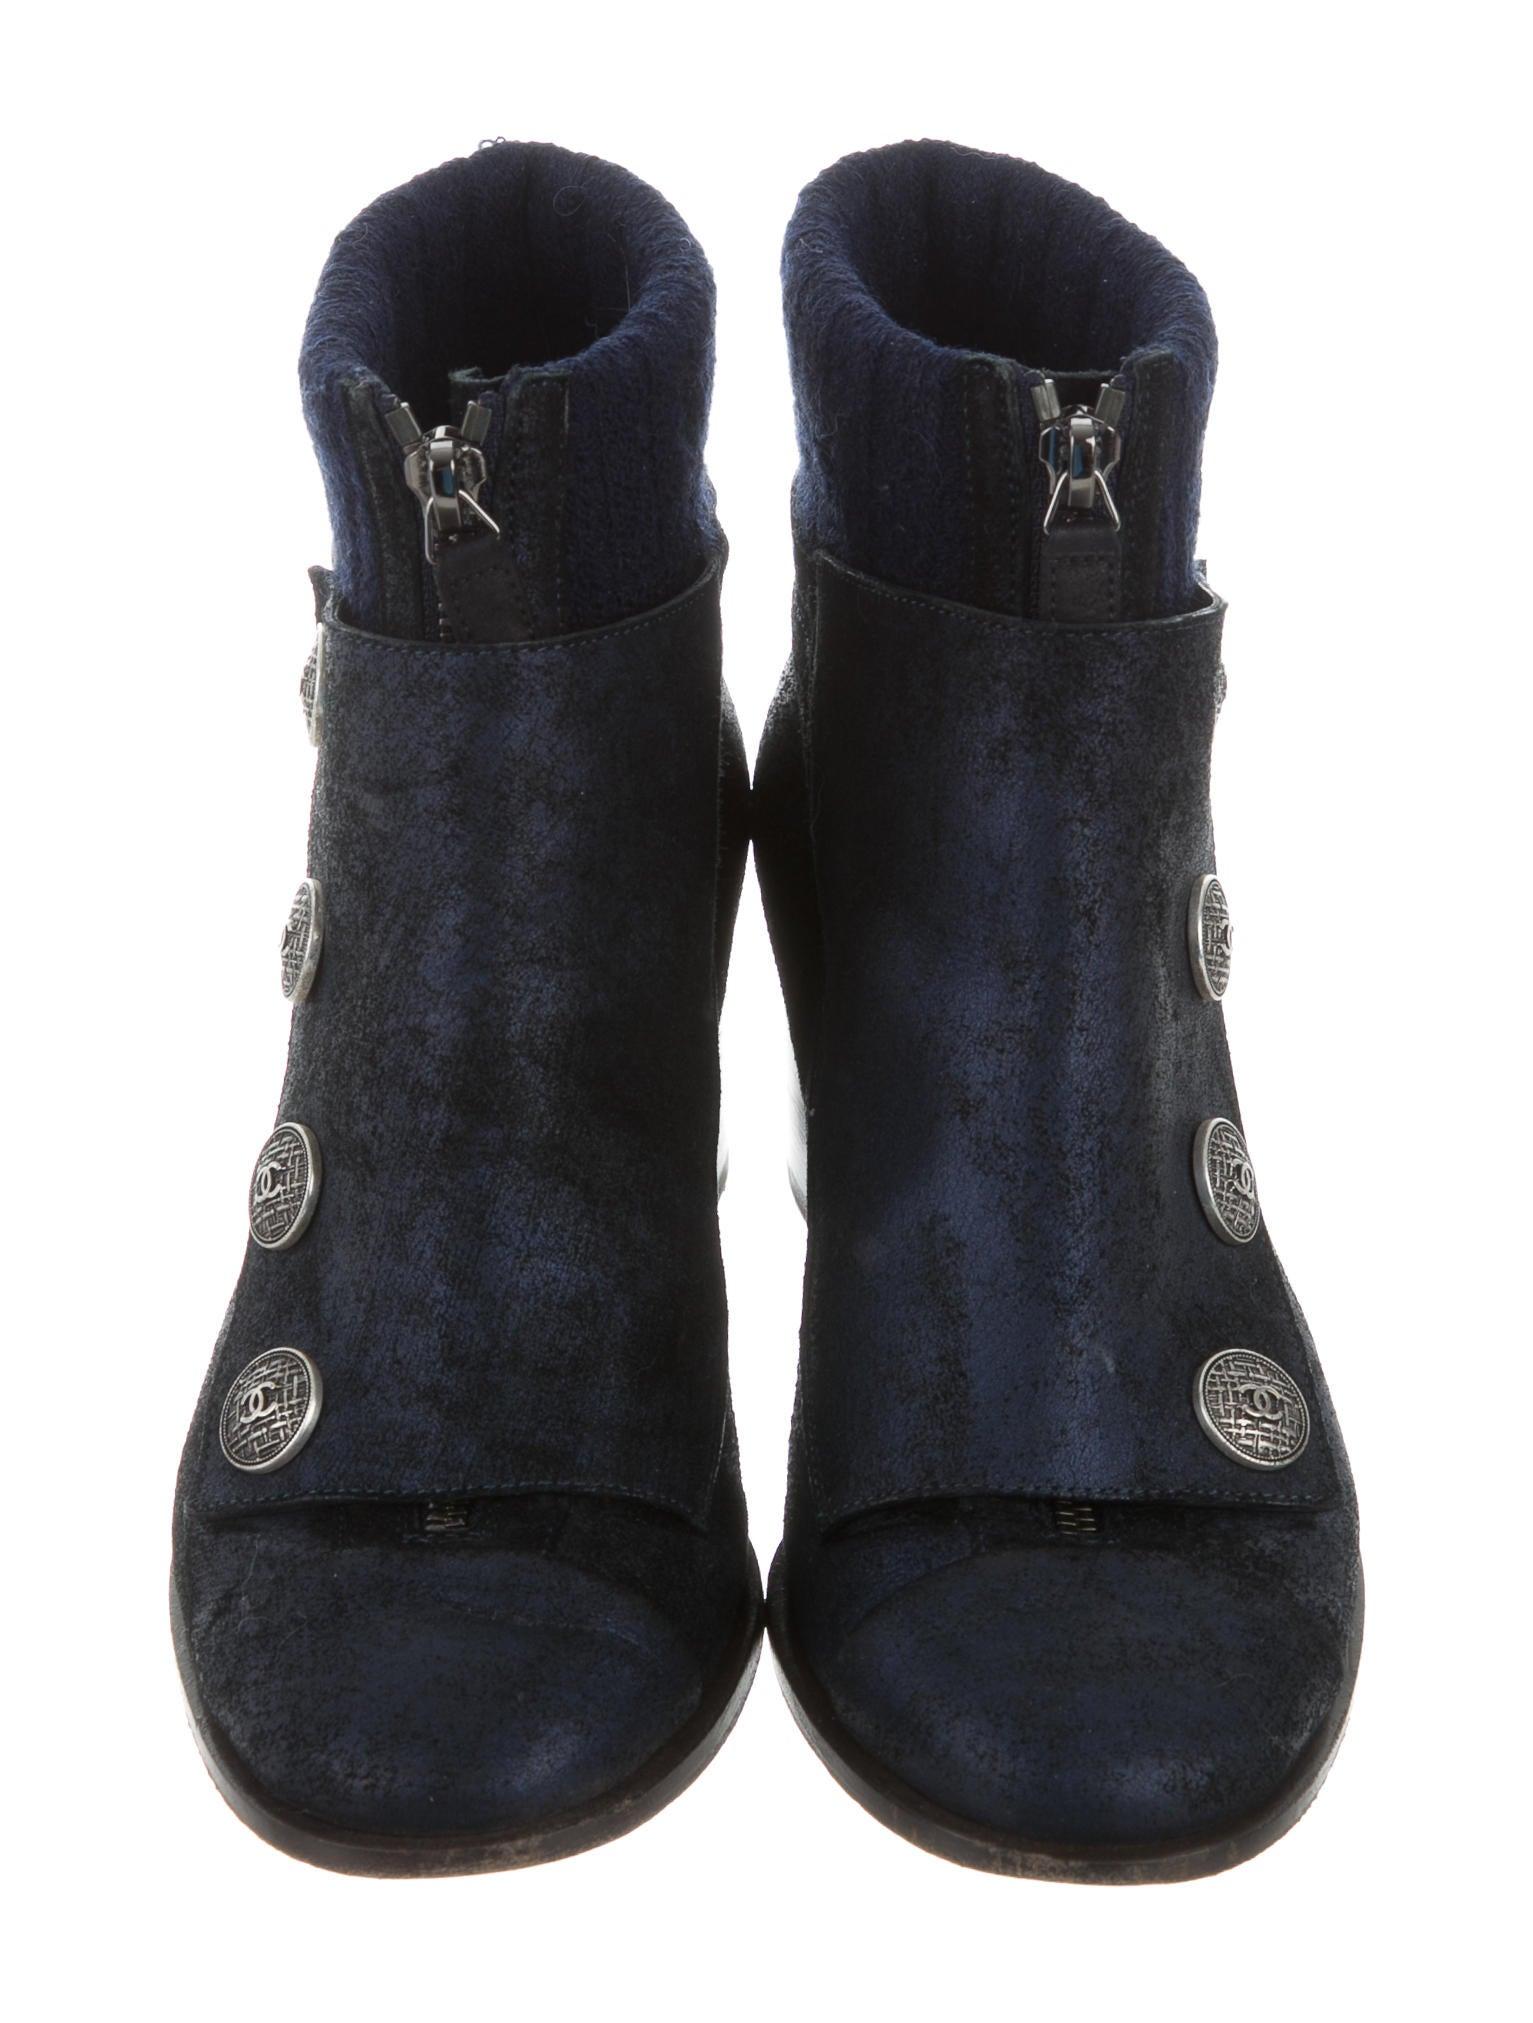 chanel cc edinburgh ankle boots shoes cha160746